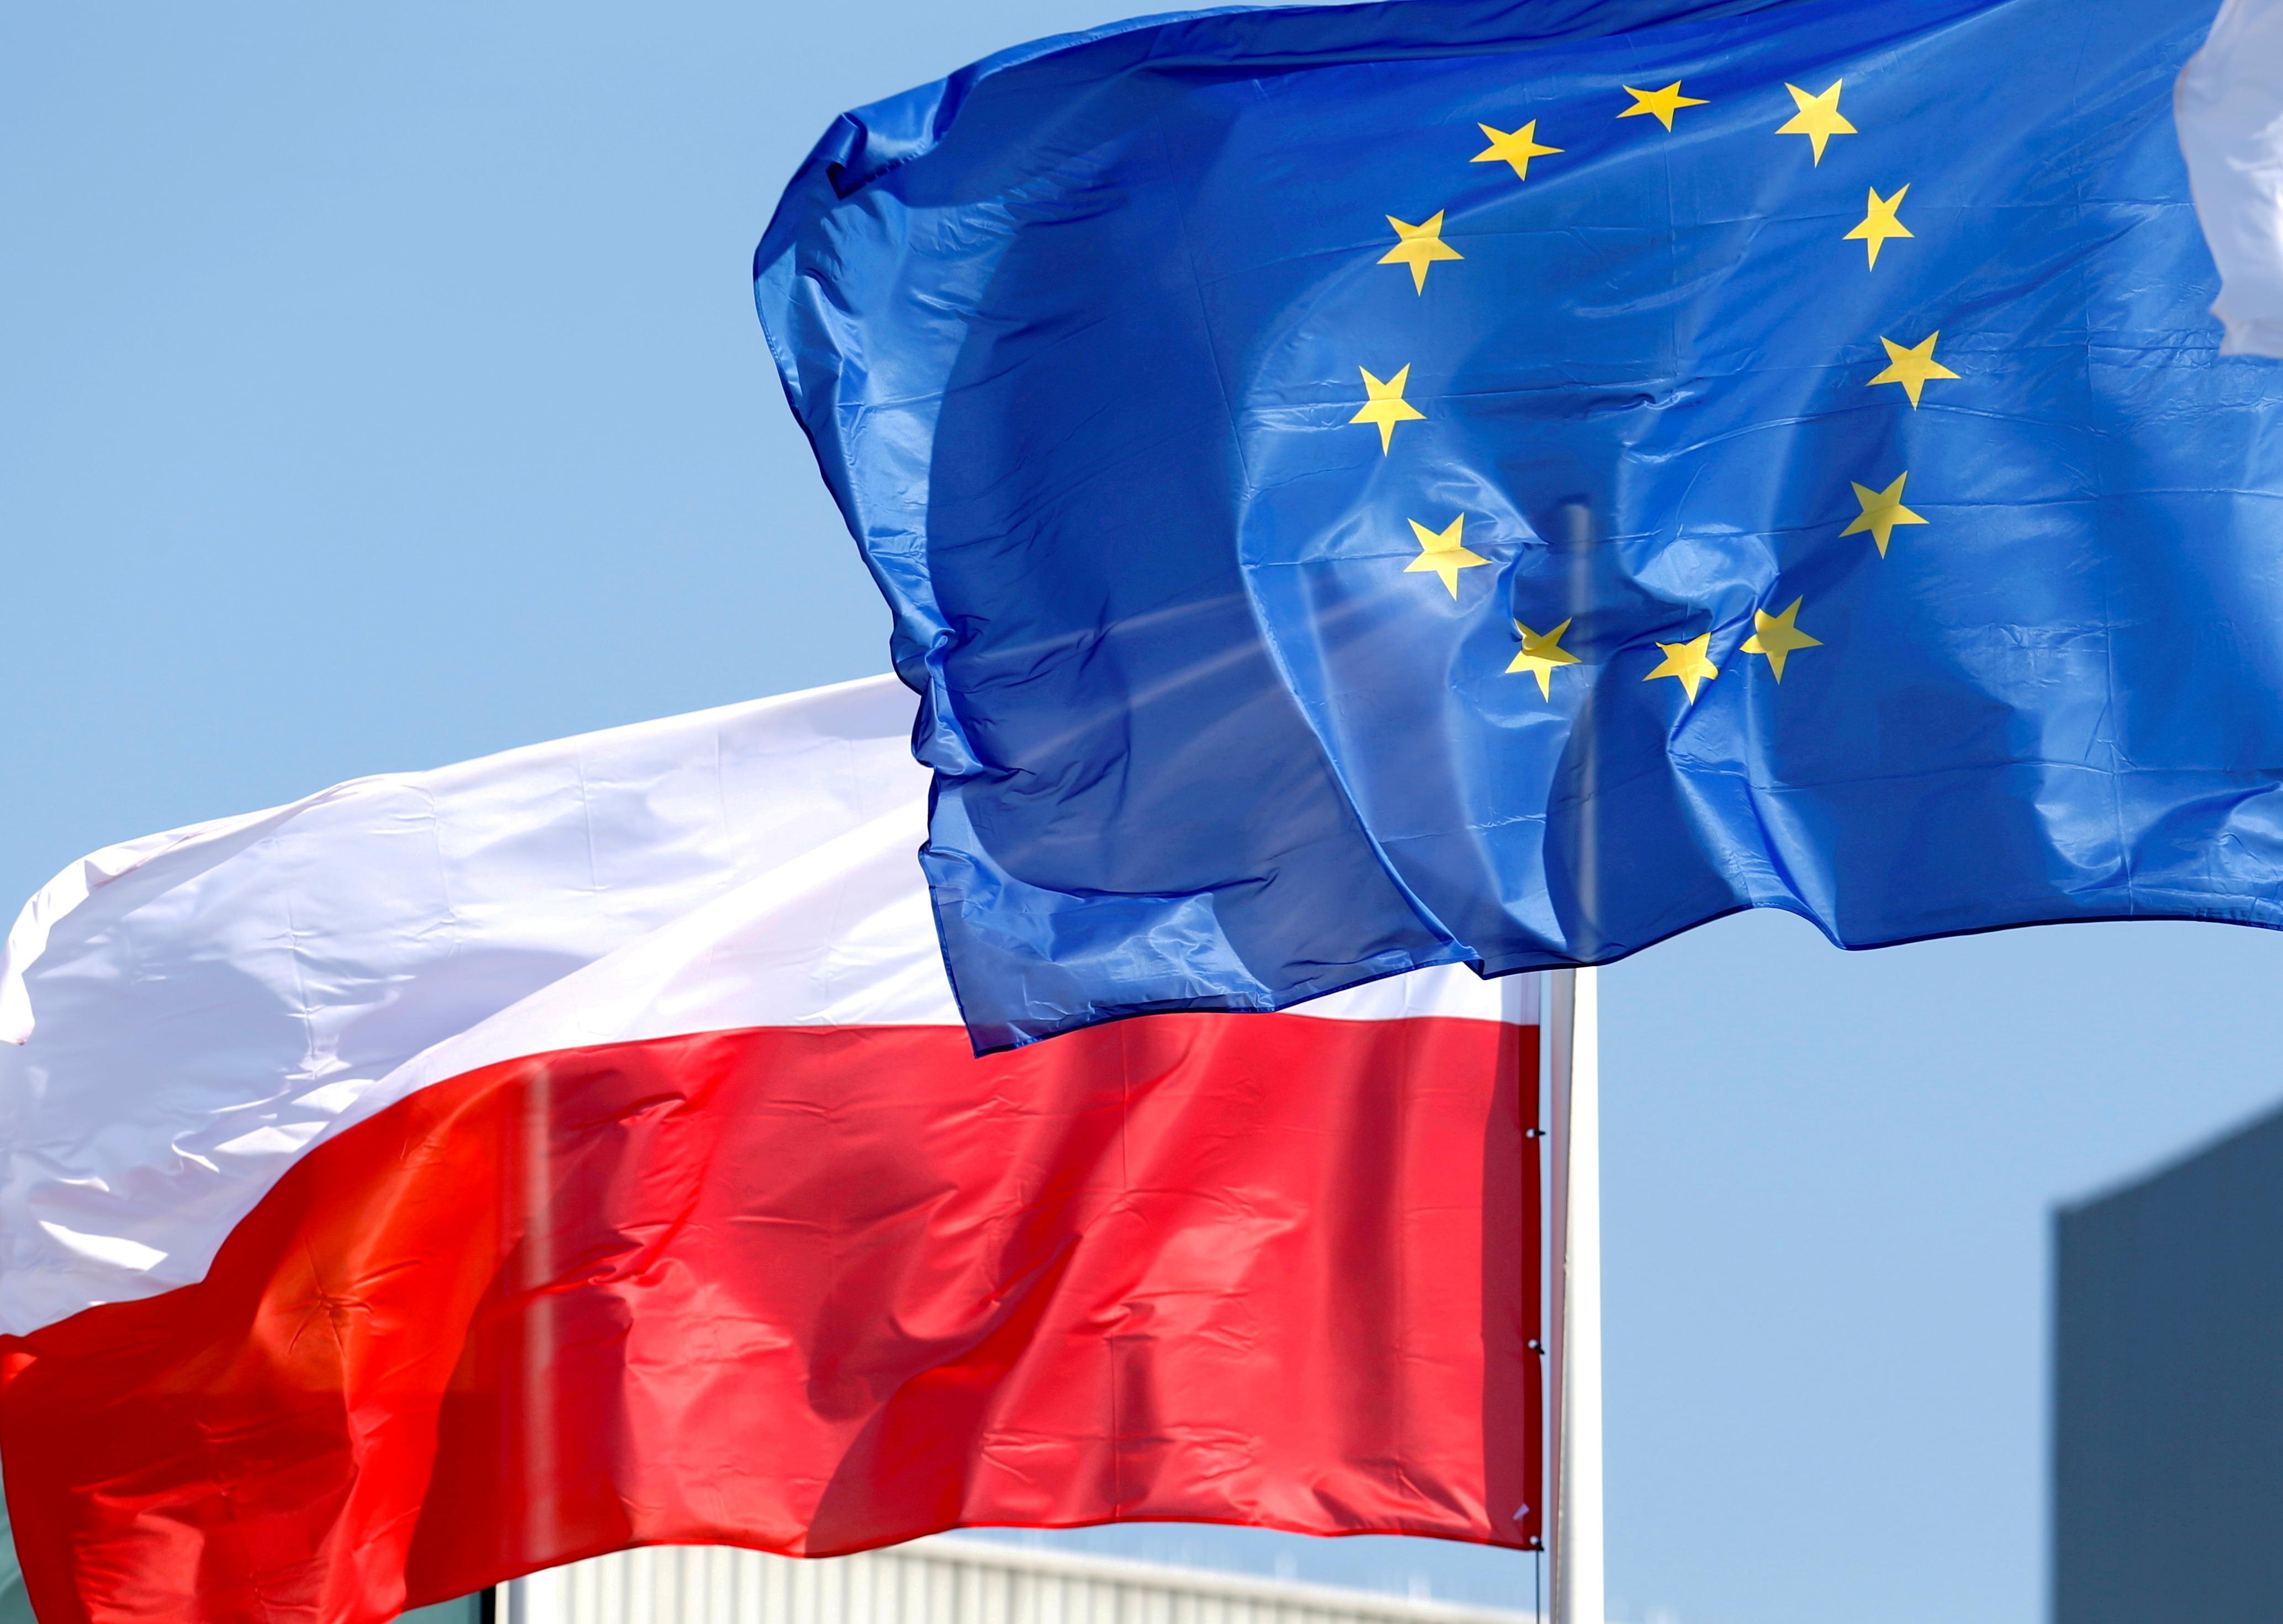 European Union and Polish flags flutter in Mazeikiai, Lithuania April 5, 2019. REUTERS/Ints Kalnins/File Photo